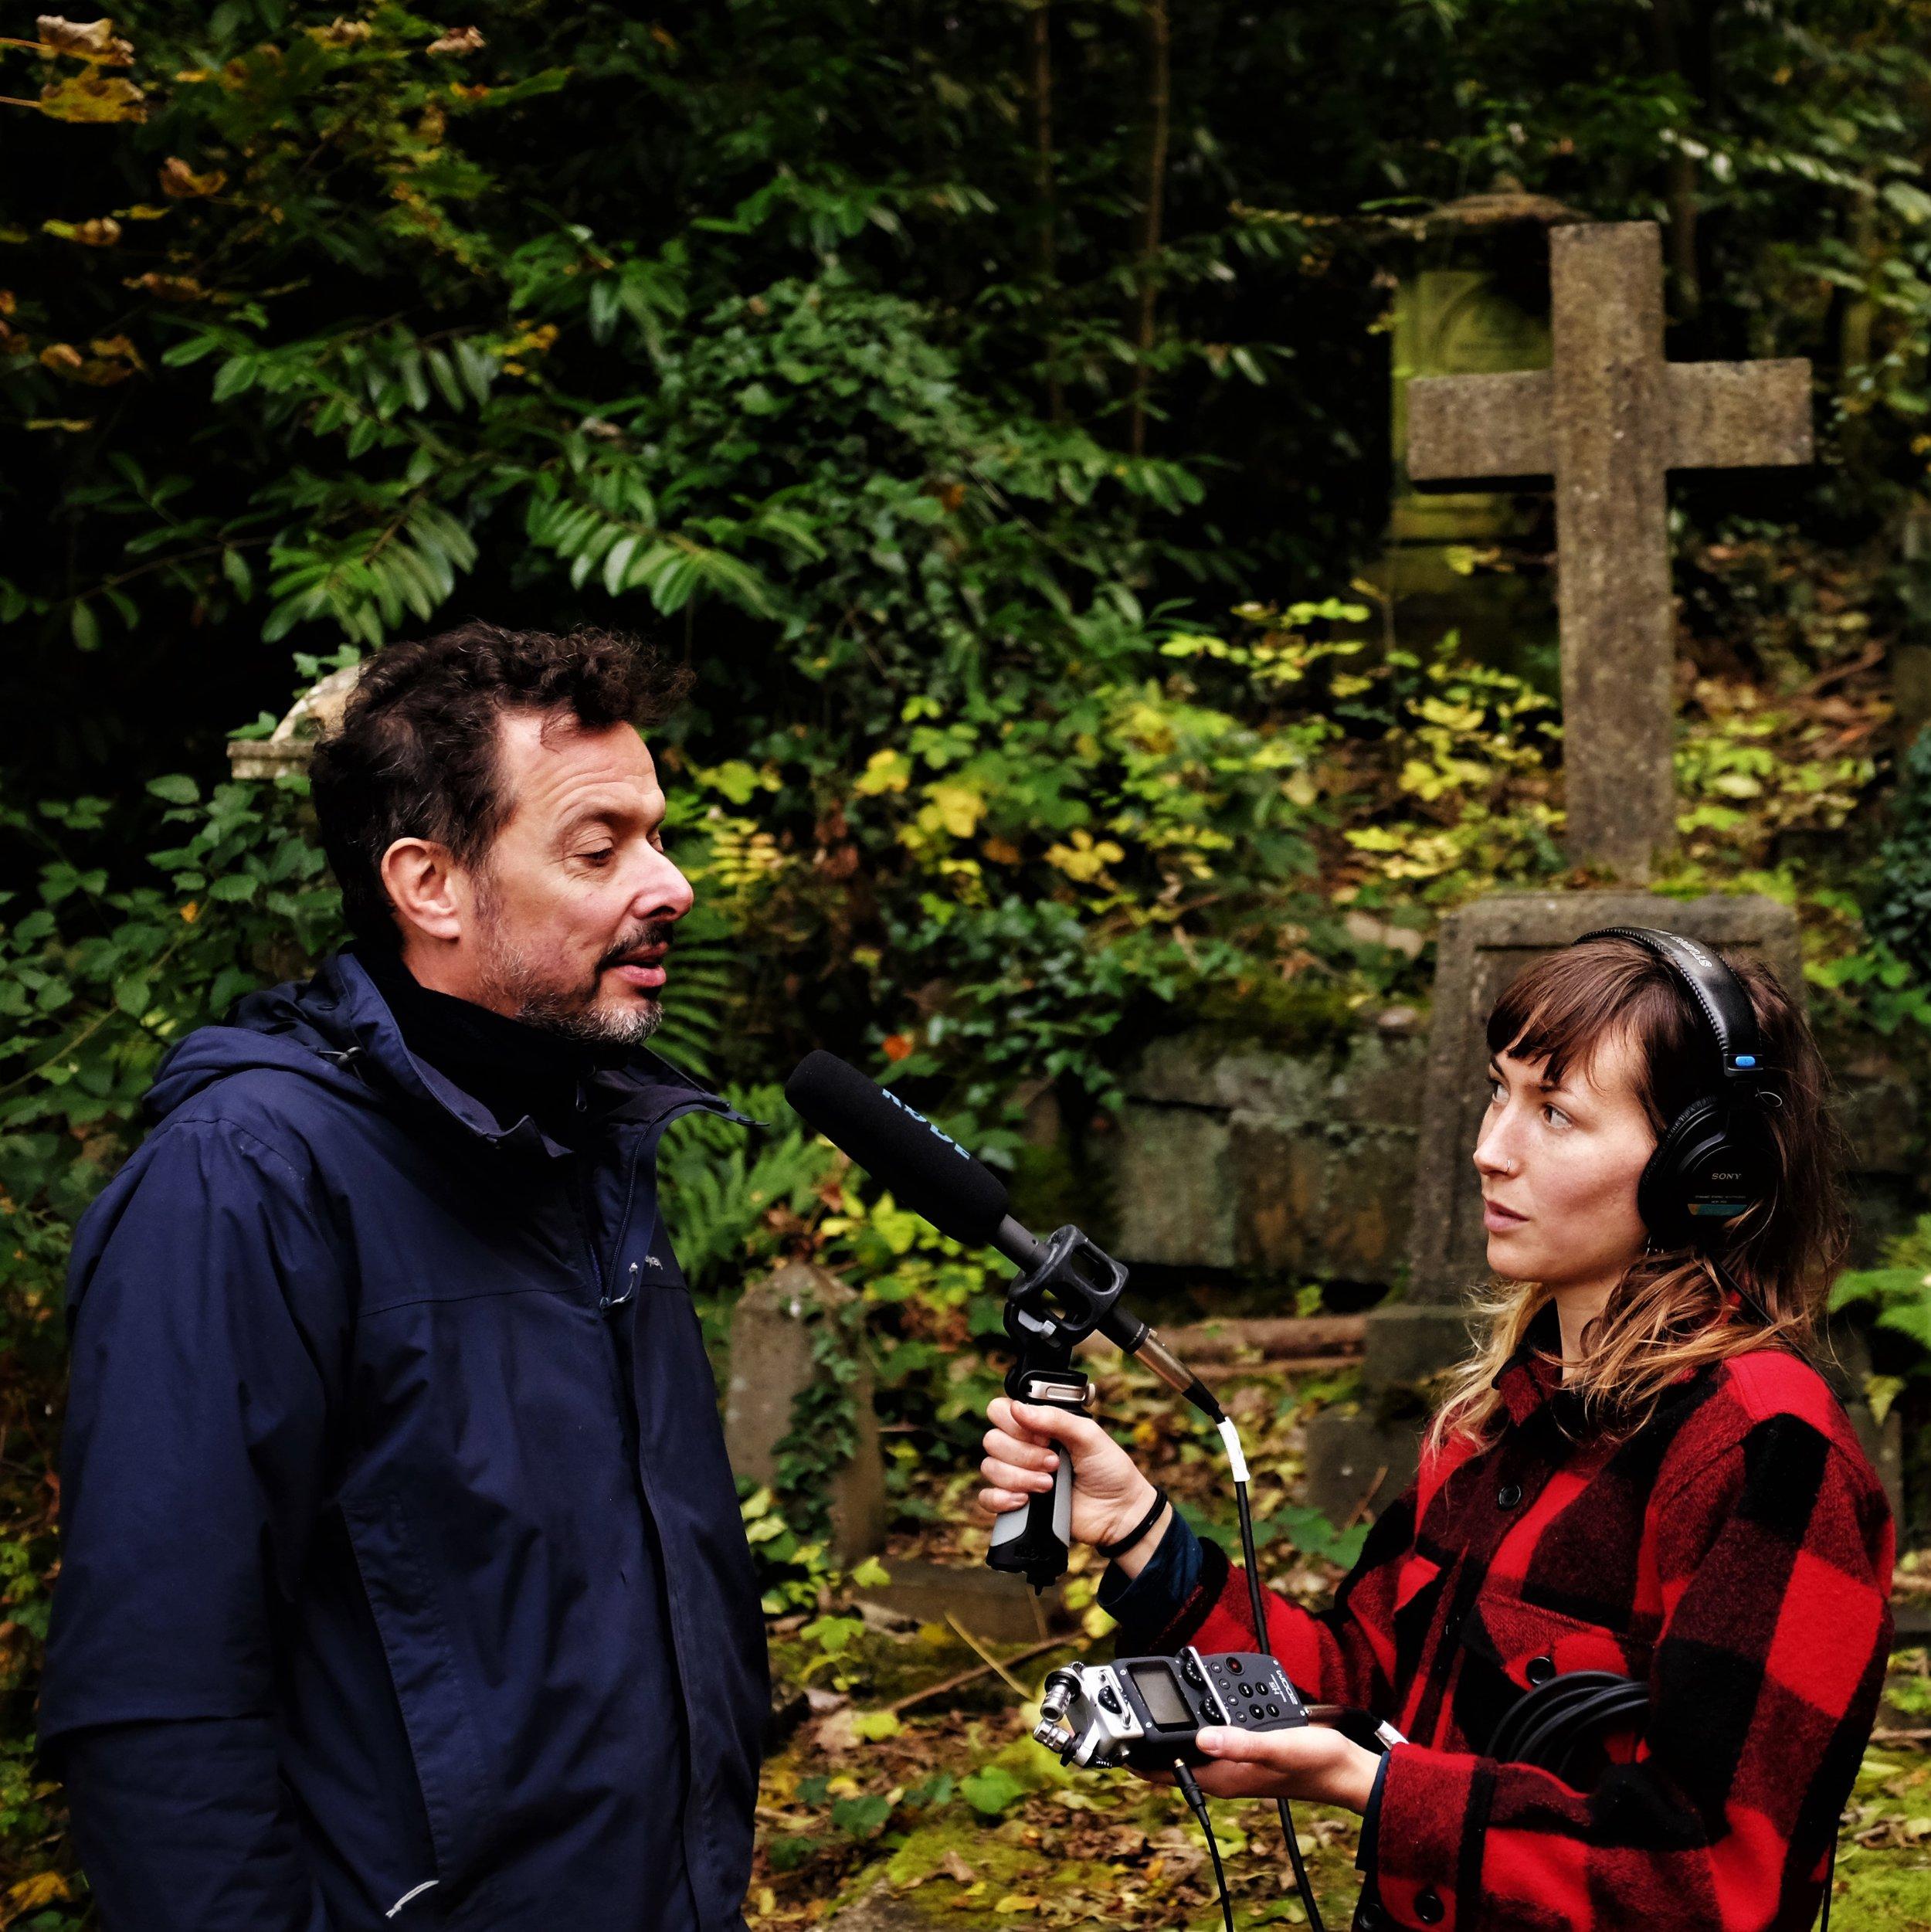 Katie_Thornton_Cemetery_Historian_Audio_Storyteller_Fulbright_National_Geographic_Digital_Storytelling_Fellow_itskatiethornton_Cemetery_Interview_Square.jpg